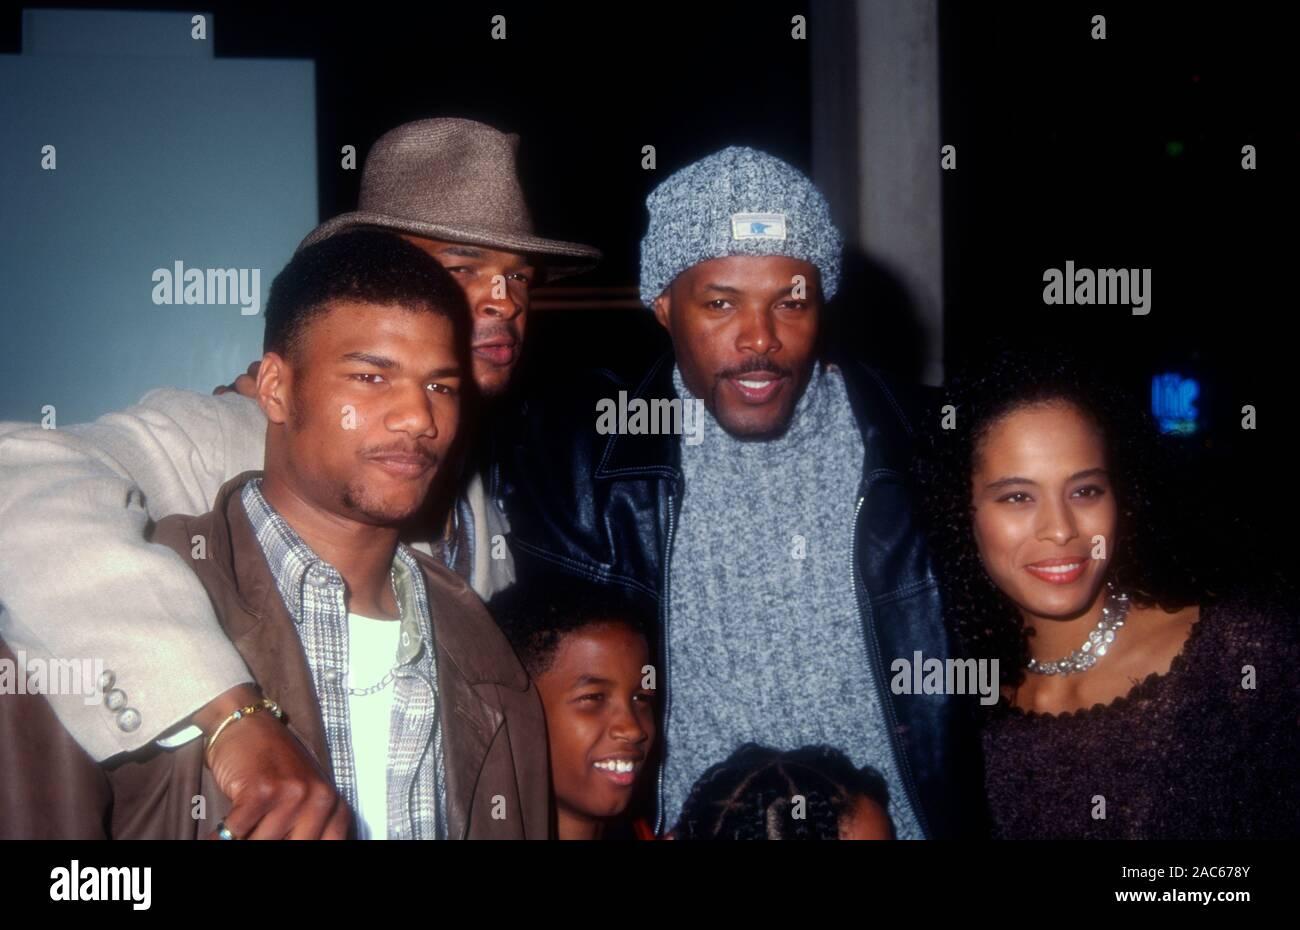 Century City California Usa 22nd March 1995 Actor Damien Dante Wayans Comedian Damon Wayans Son Michael